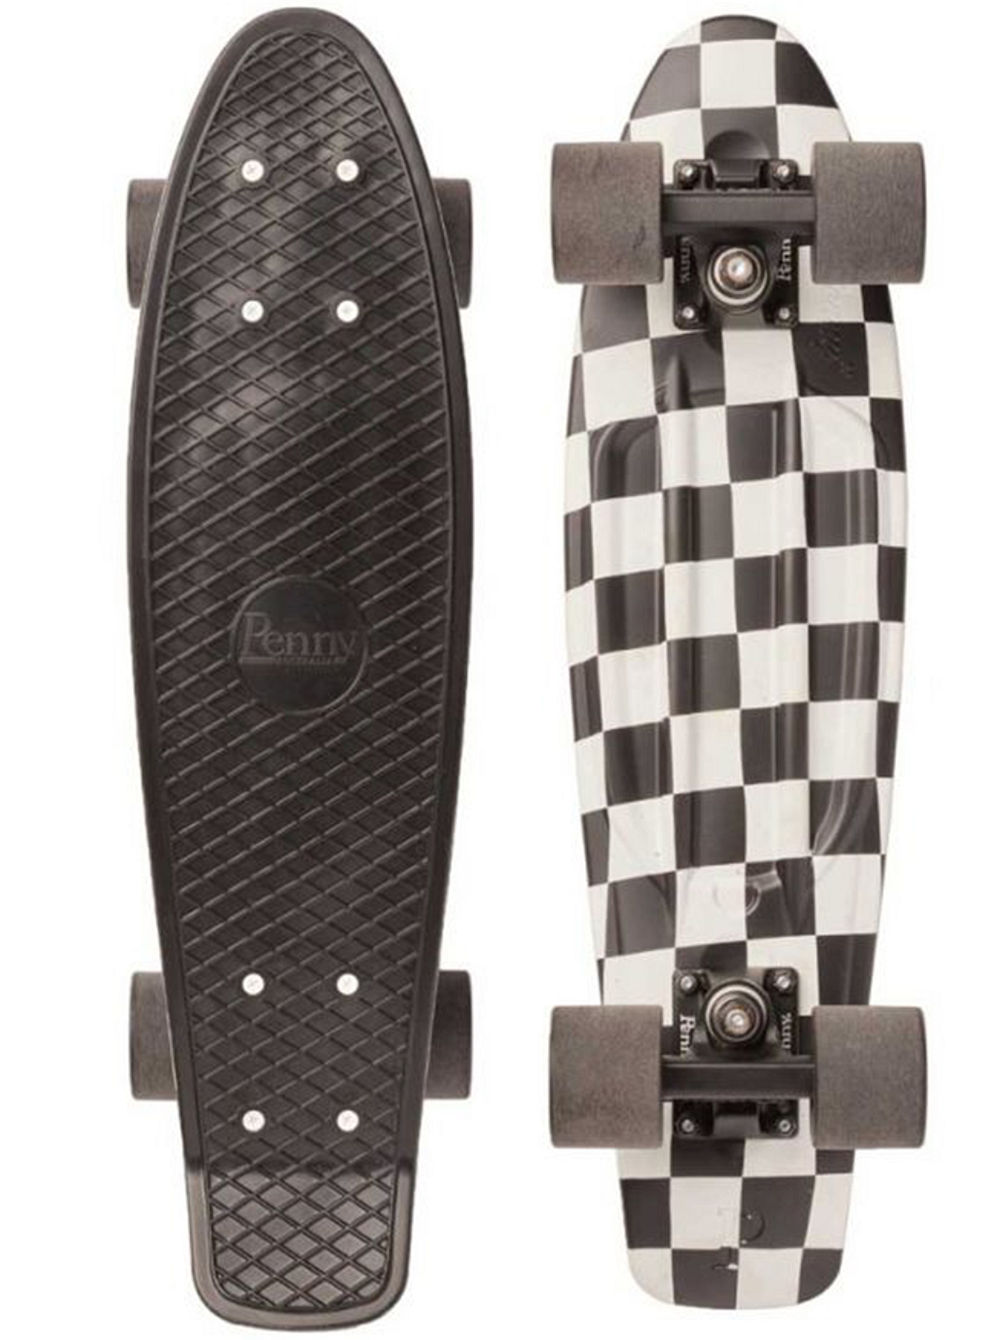 20a9ac80f63d13 Penny Skateboards 22